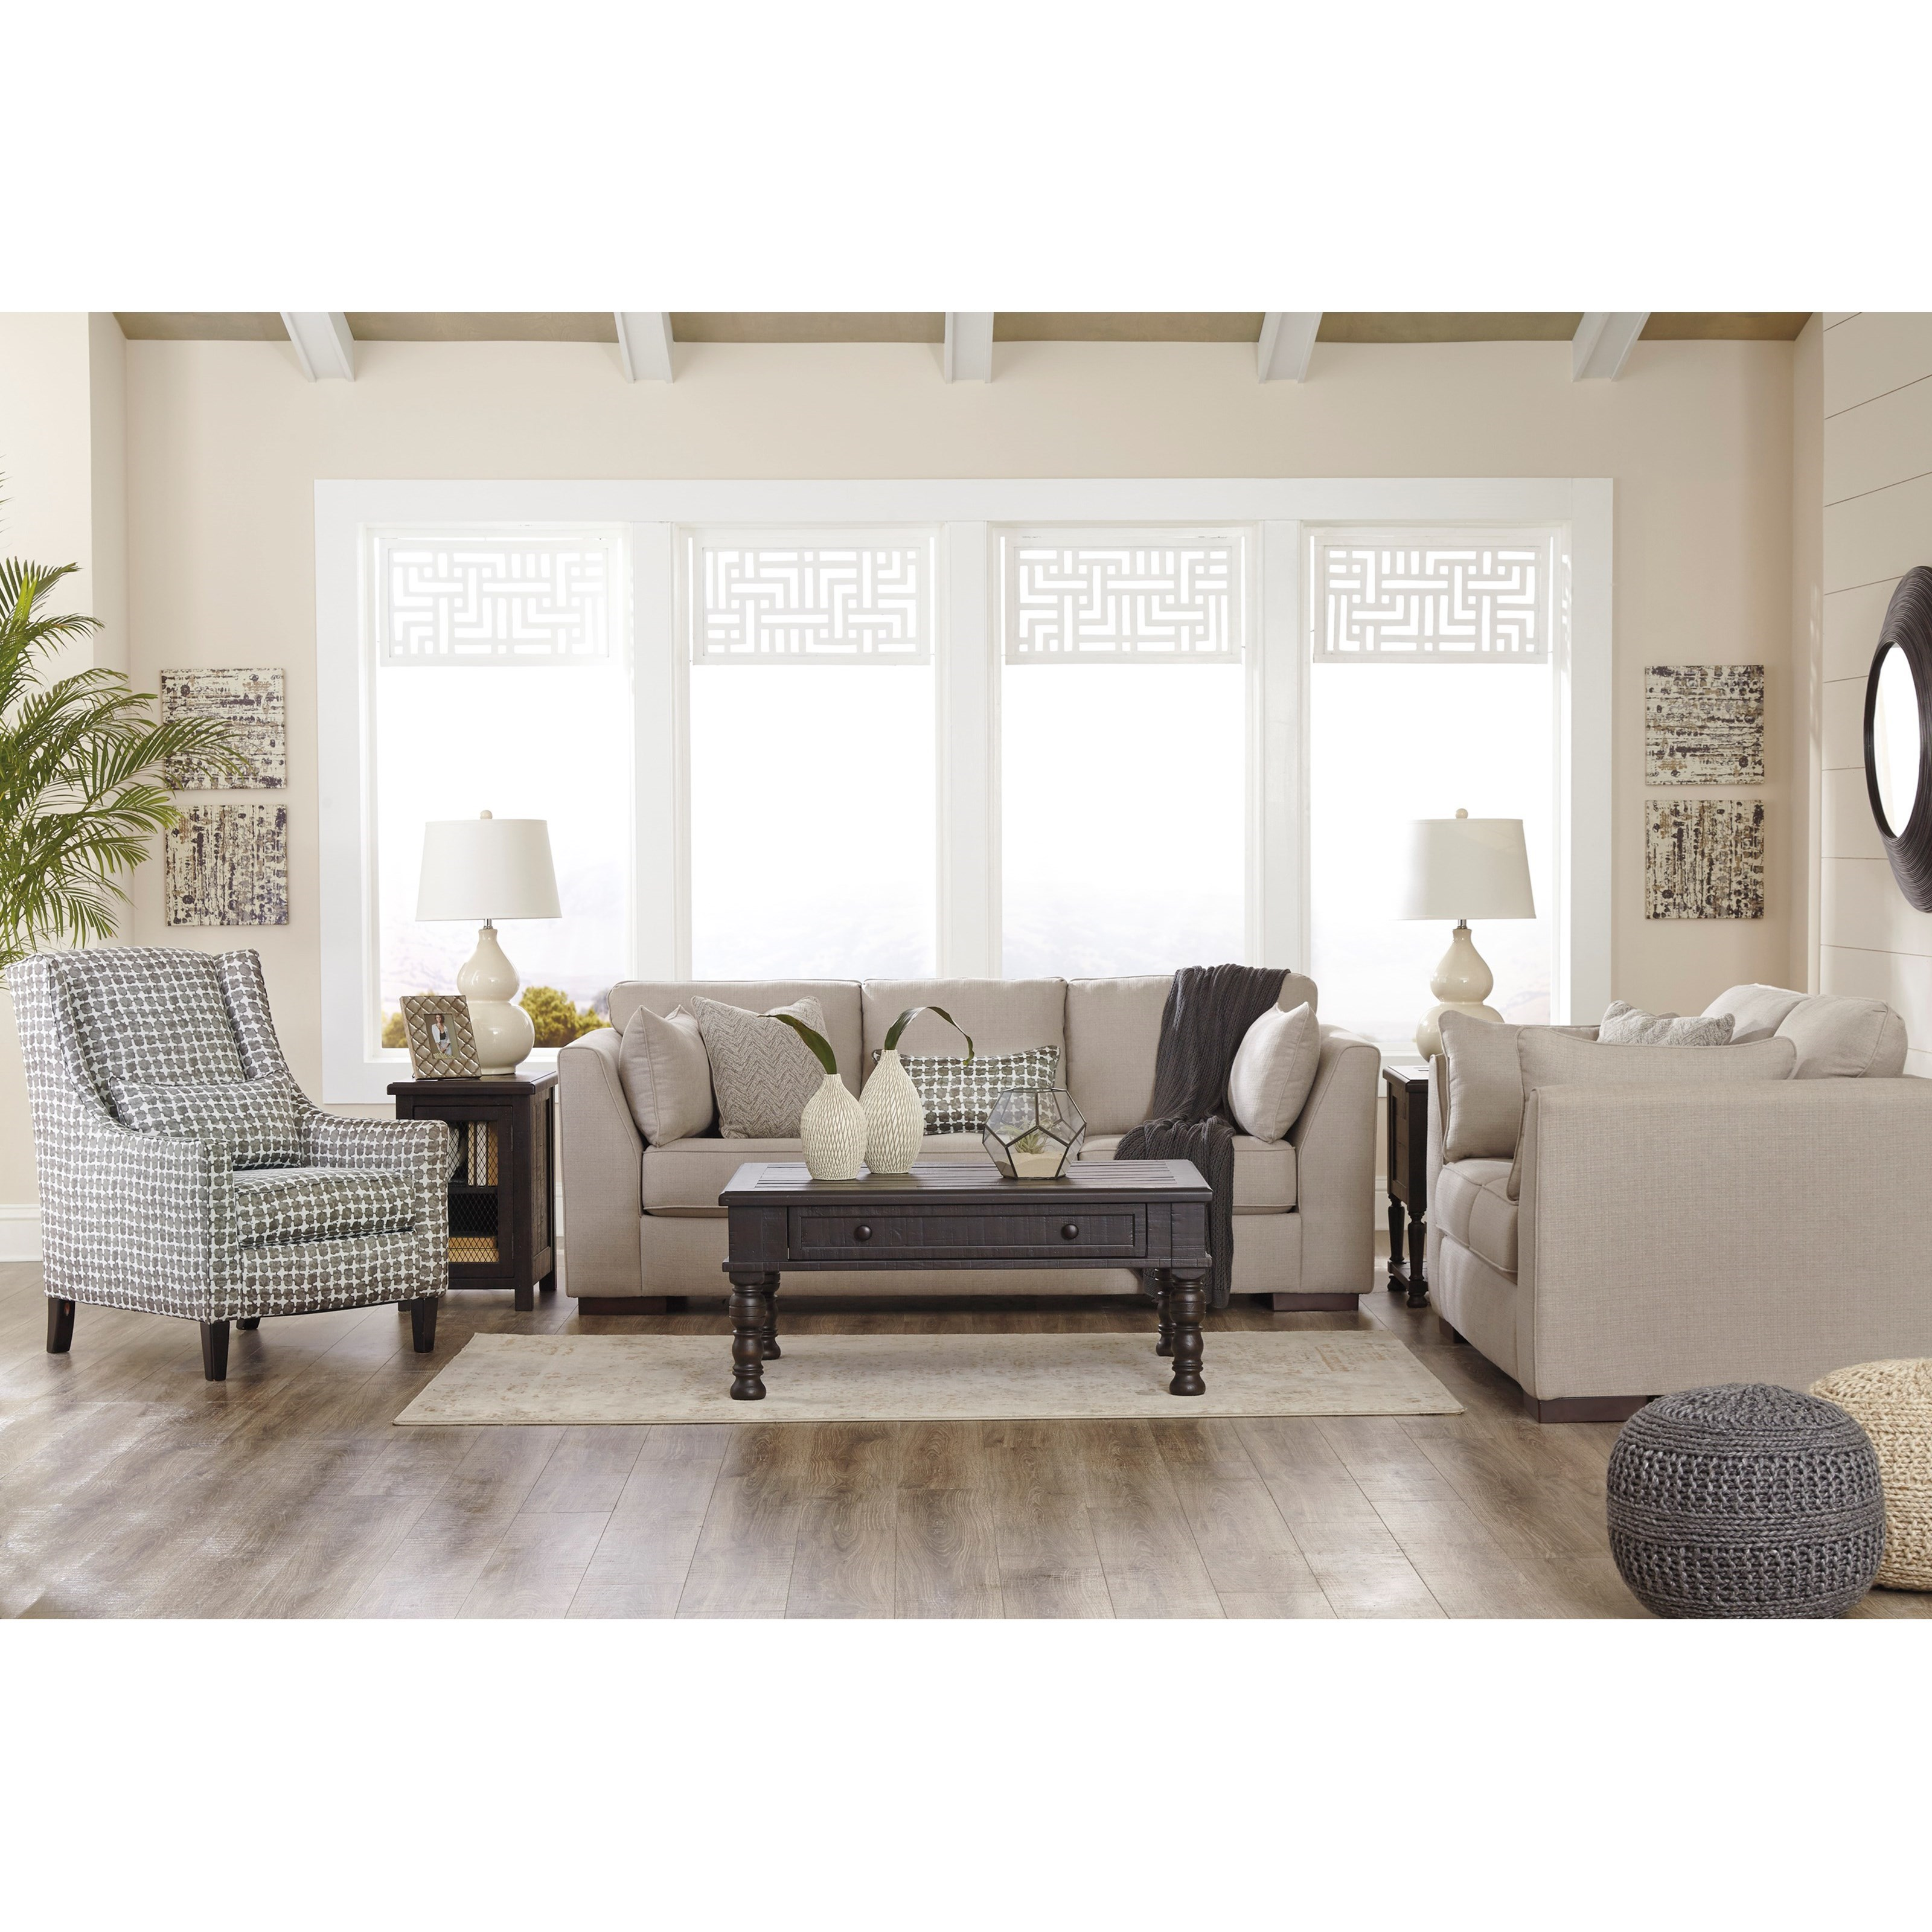 Ashley/Benchcraft Lainier Stationary Living Room Group - Item Number: 54202 Living Room Group 2